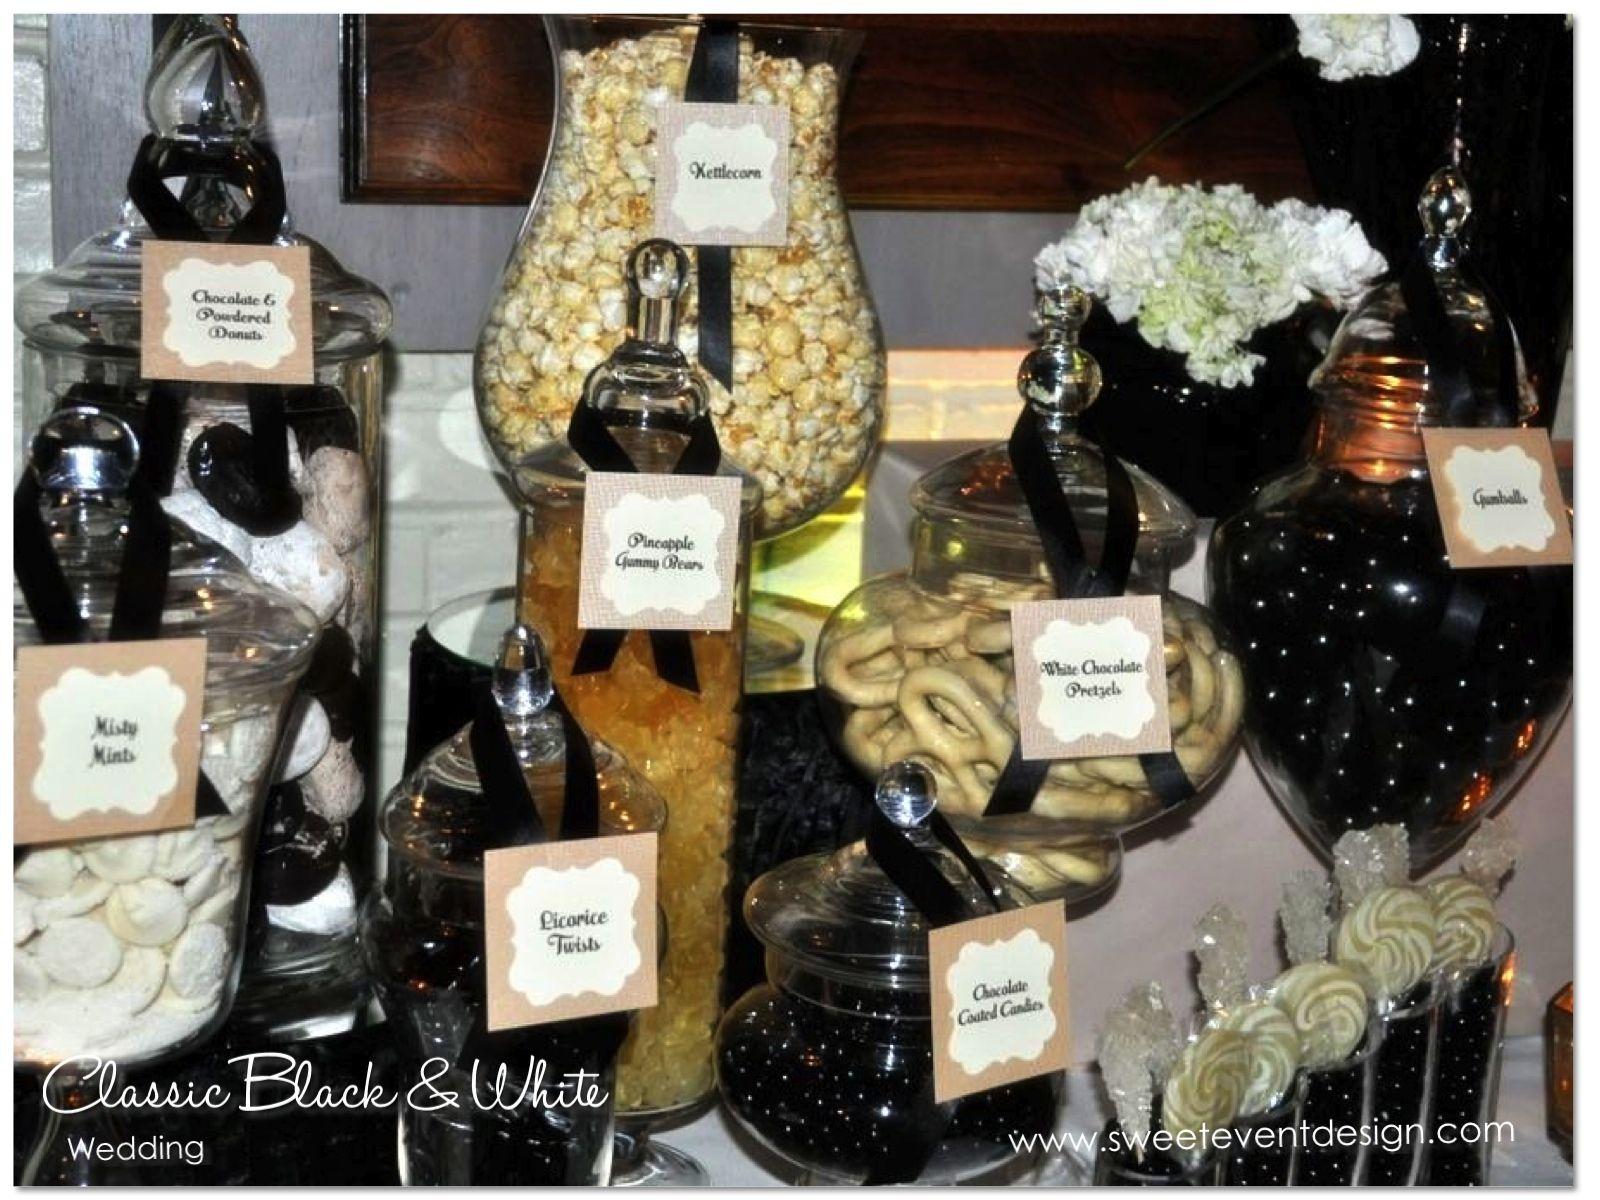 Black and White Wedding Candy Dessert Buffet www.sweeteventdesign    wedding ideas and inspiration